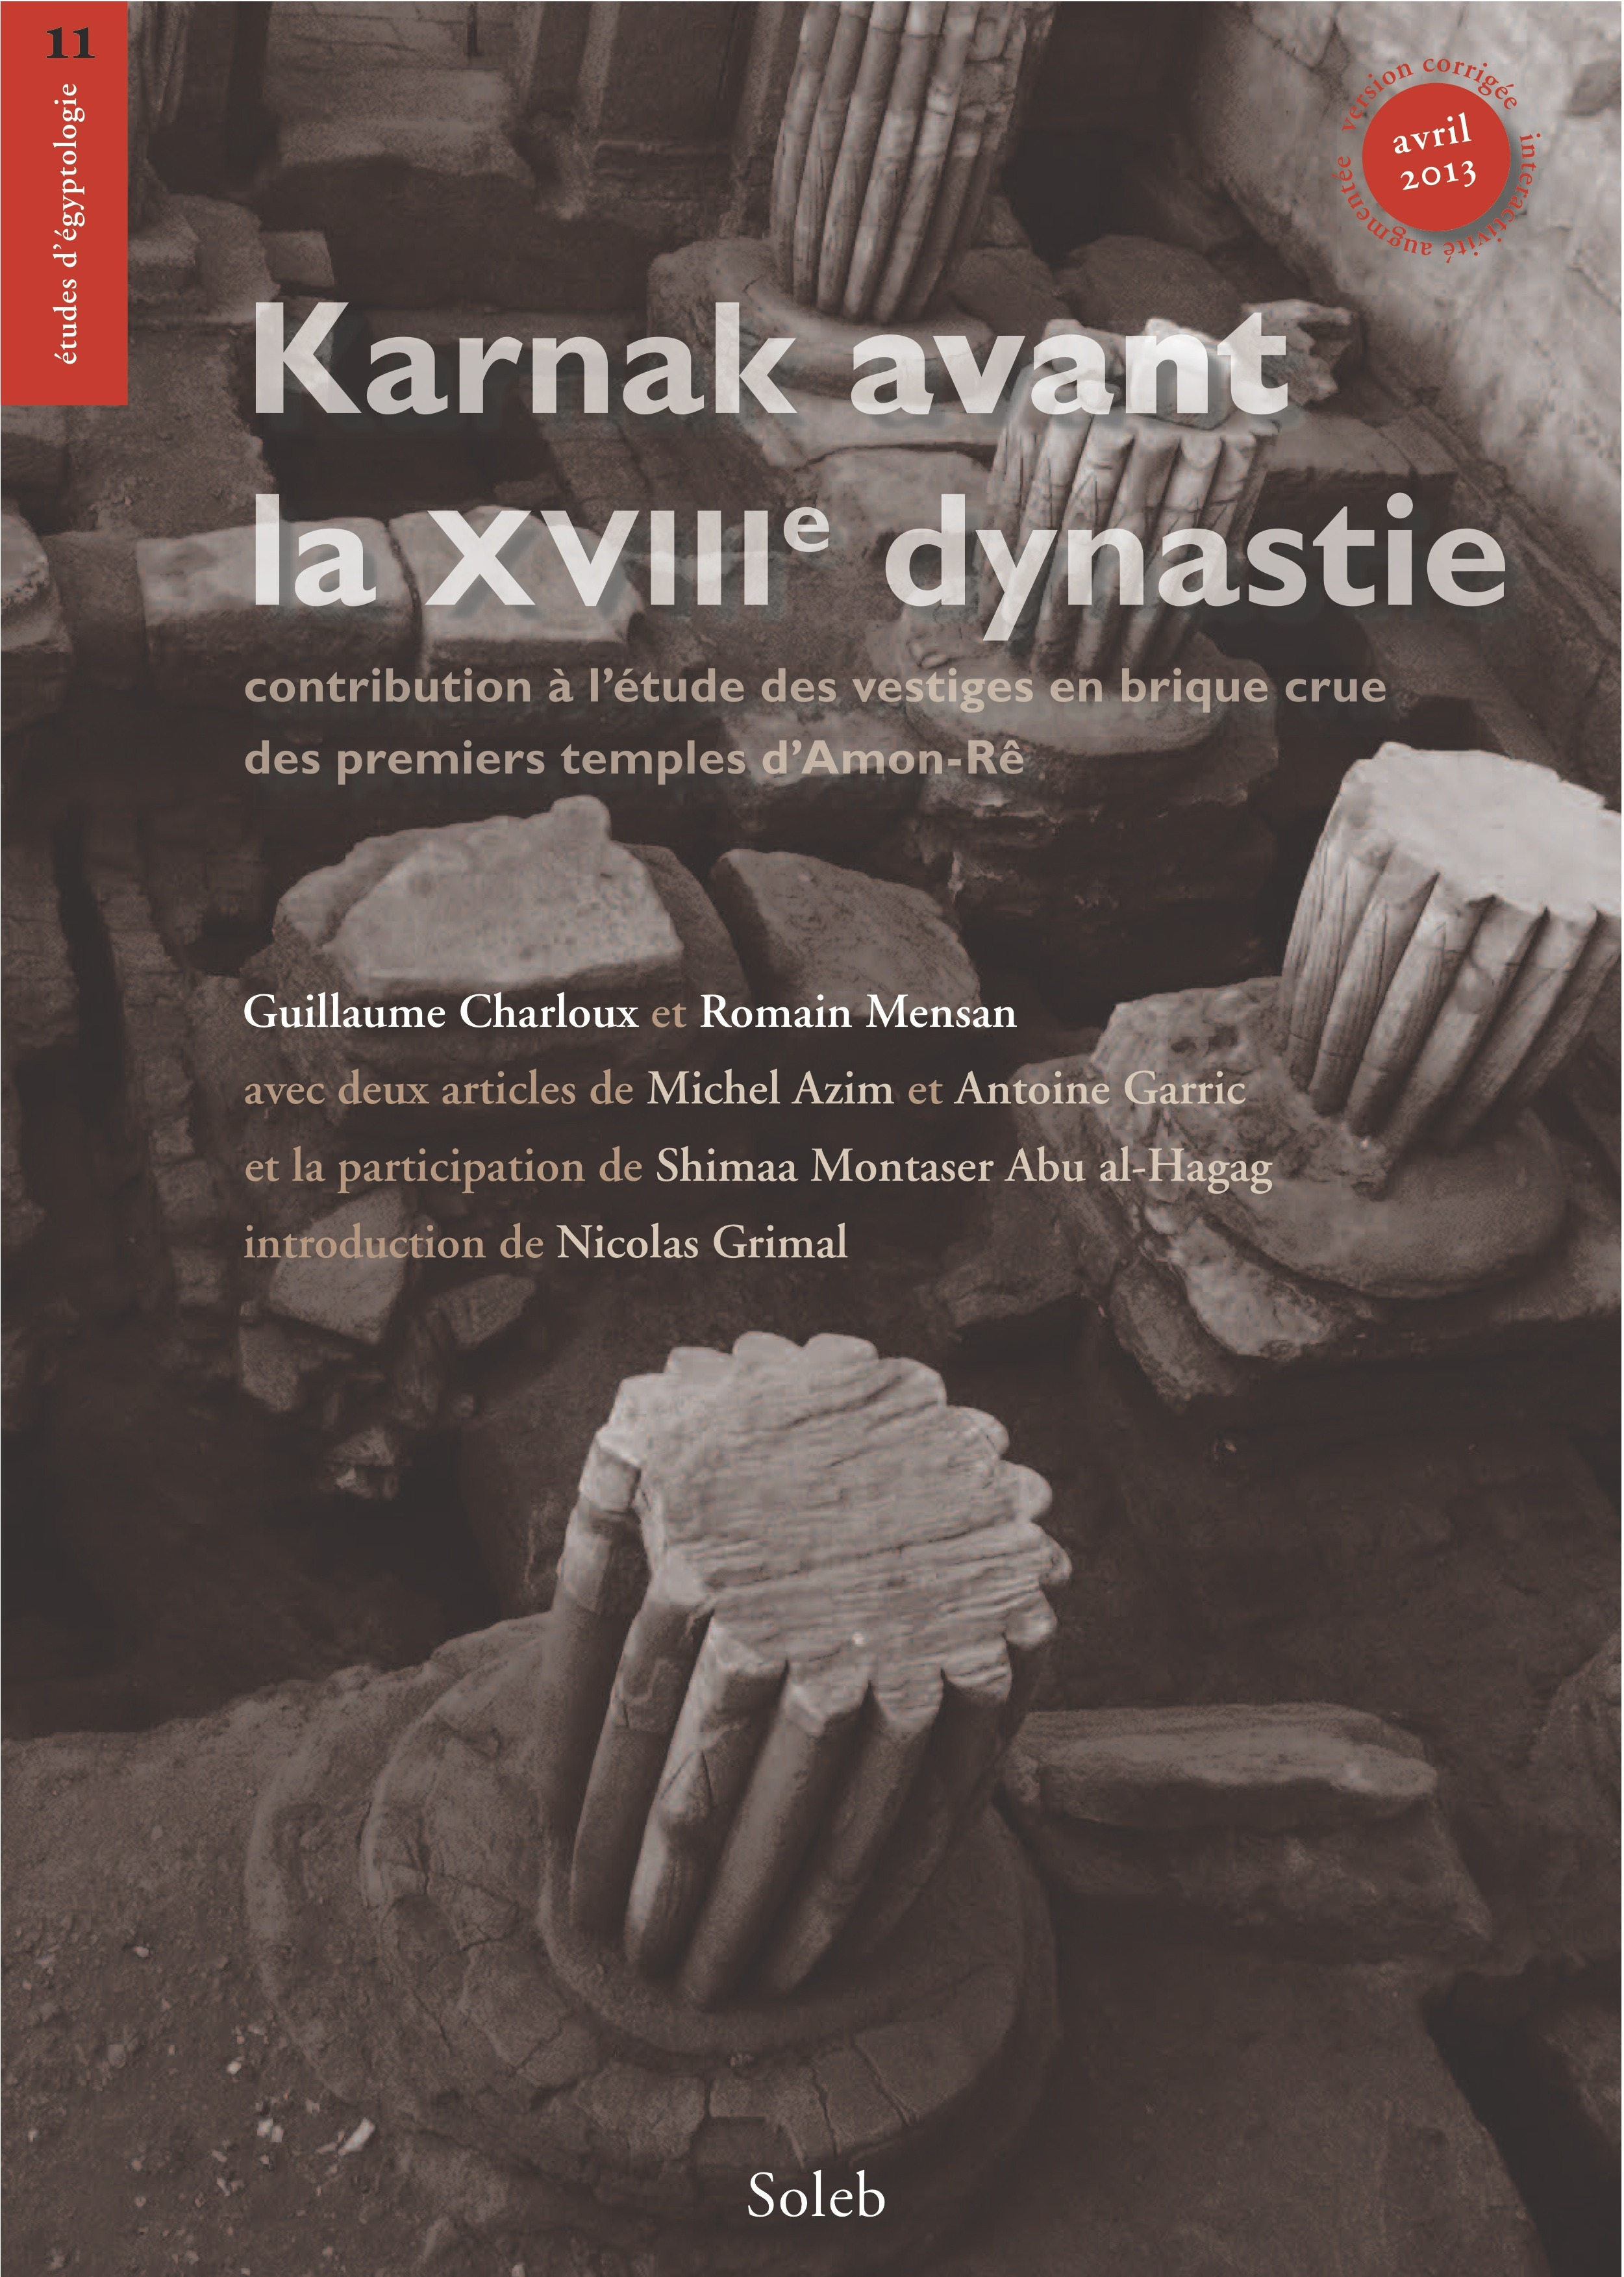 Karnak avant la XVIIIe dynastie